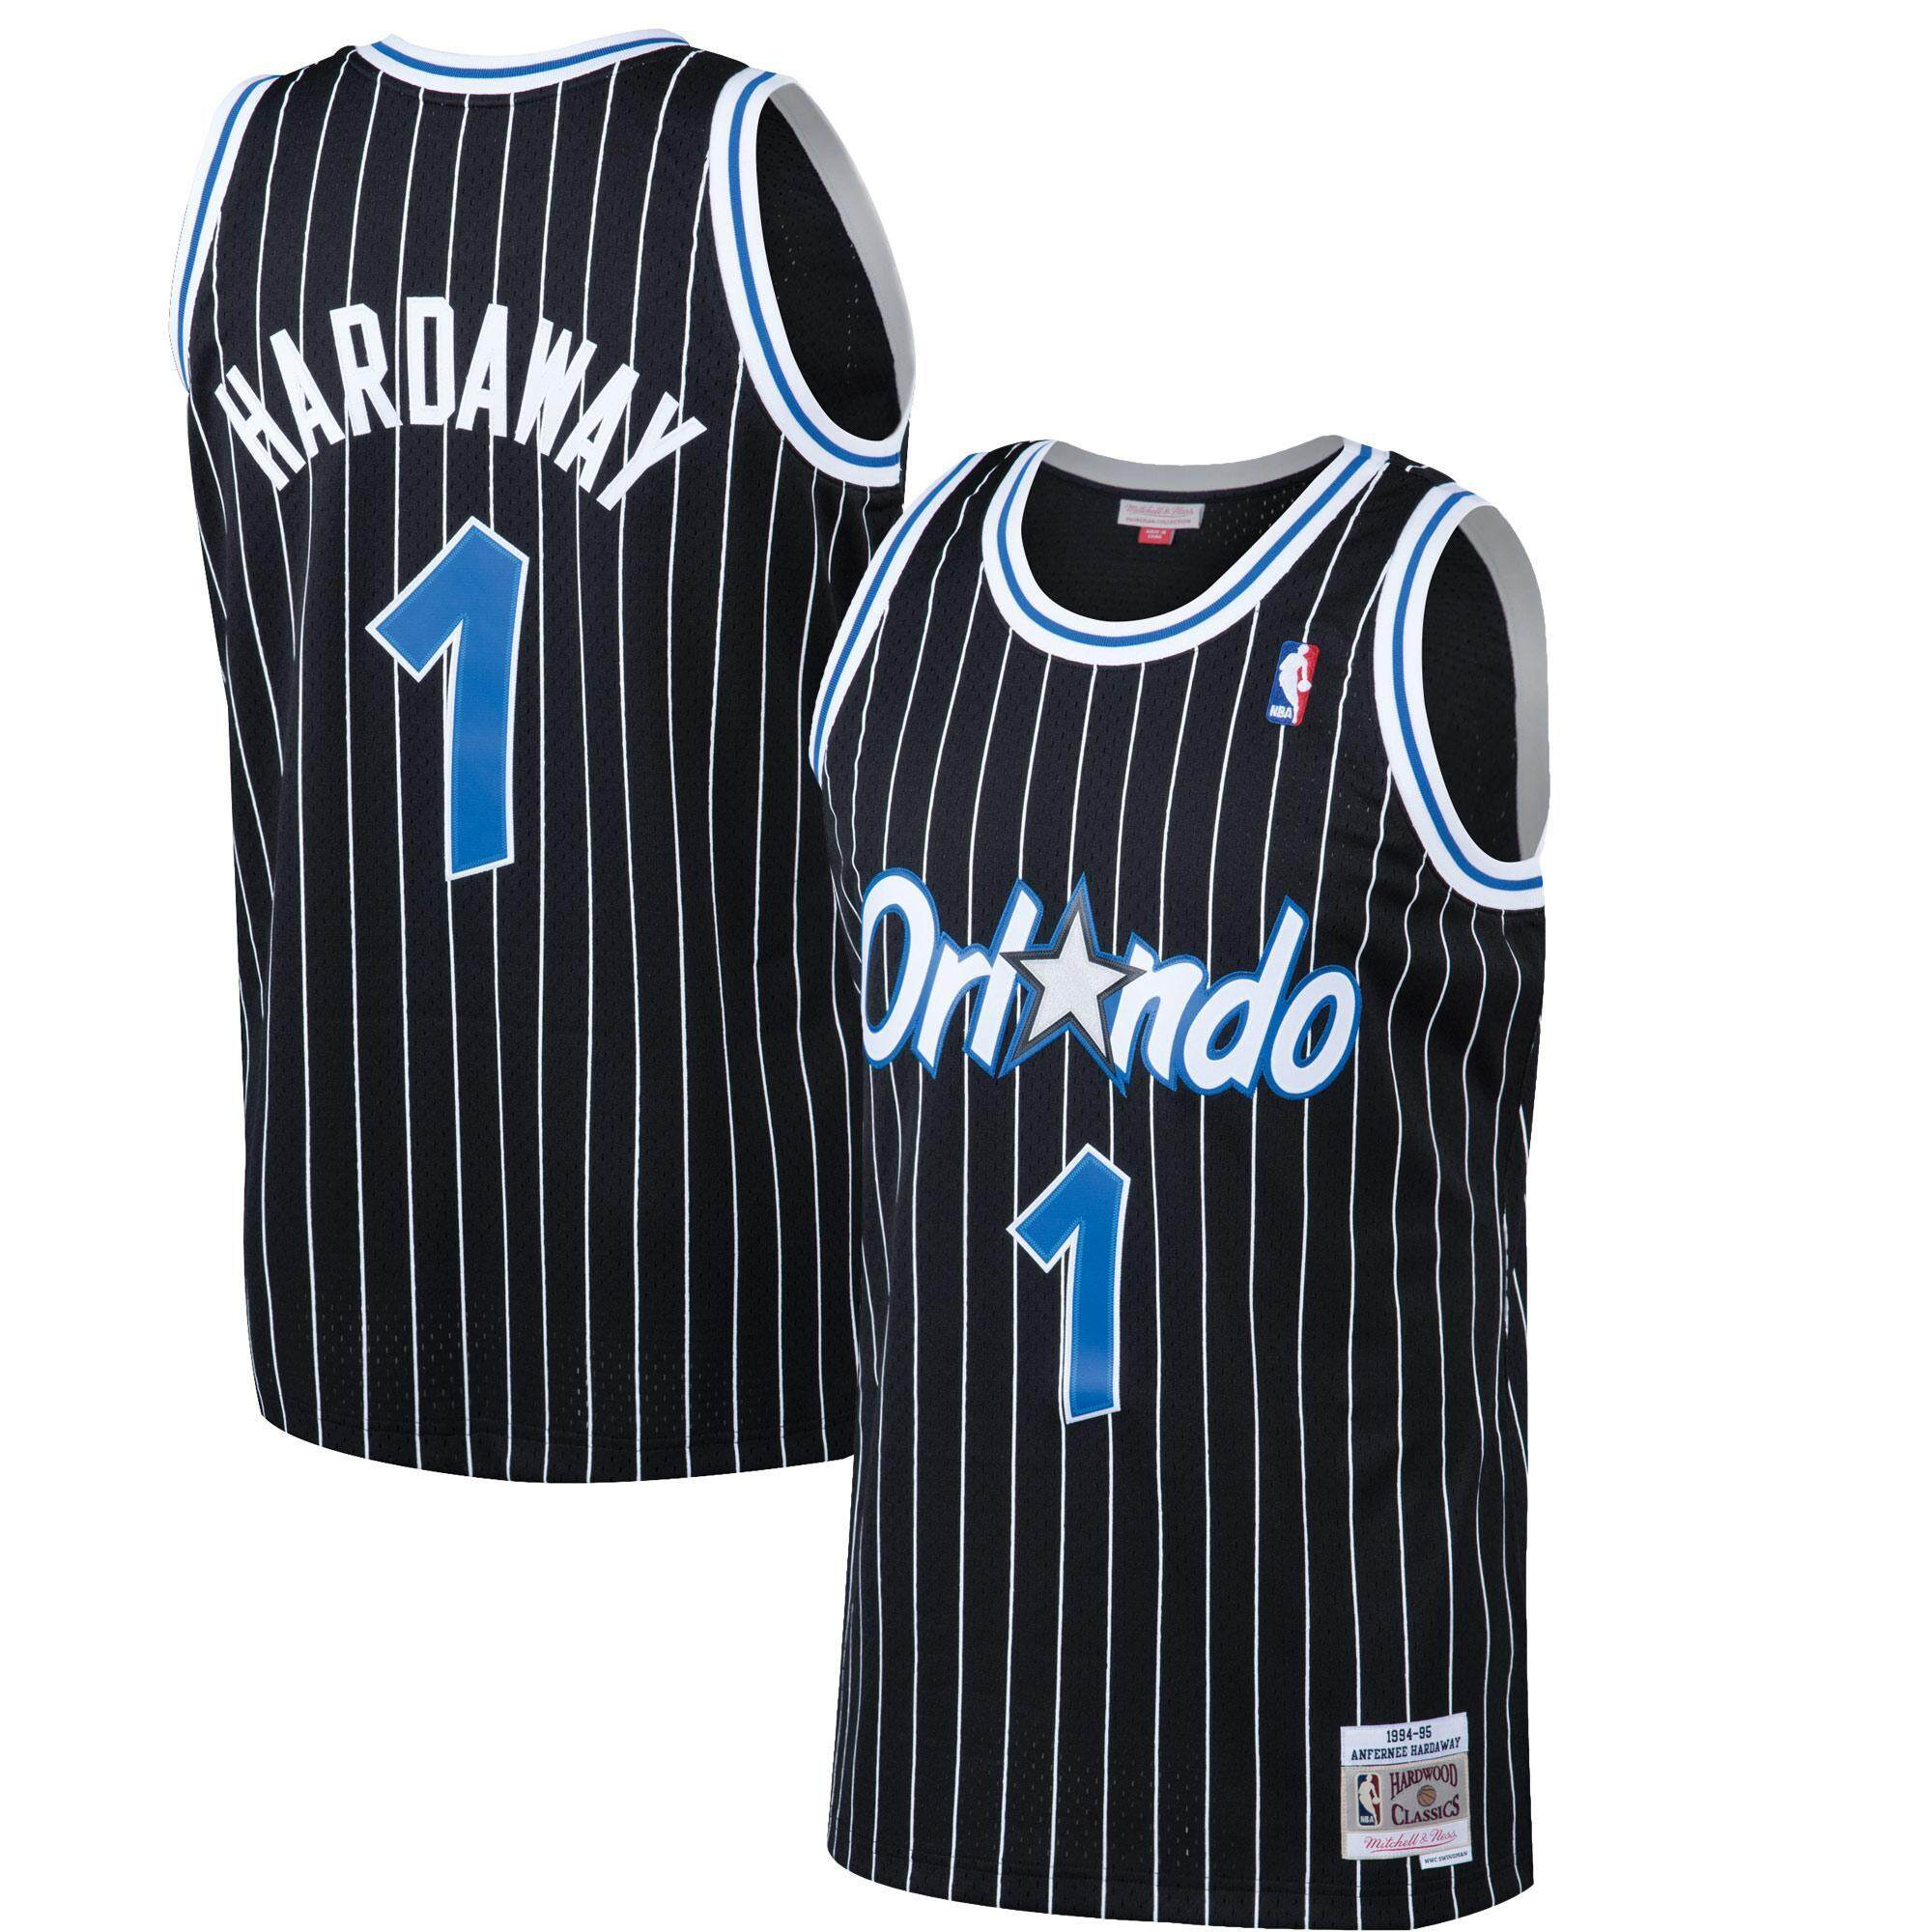 0a3a669d4a7 Basketball Clothes Swingman Jersey NBA Orlando Magic Hardwood Classics  Penny Hardaway 1994-95 Men s